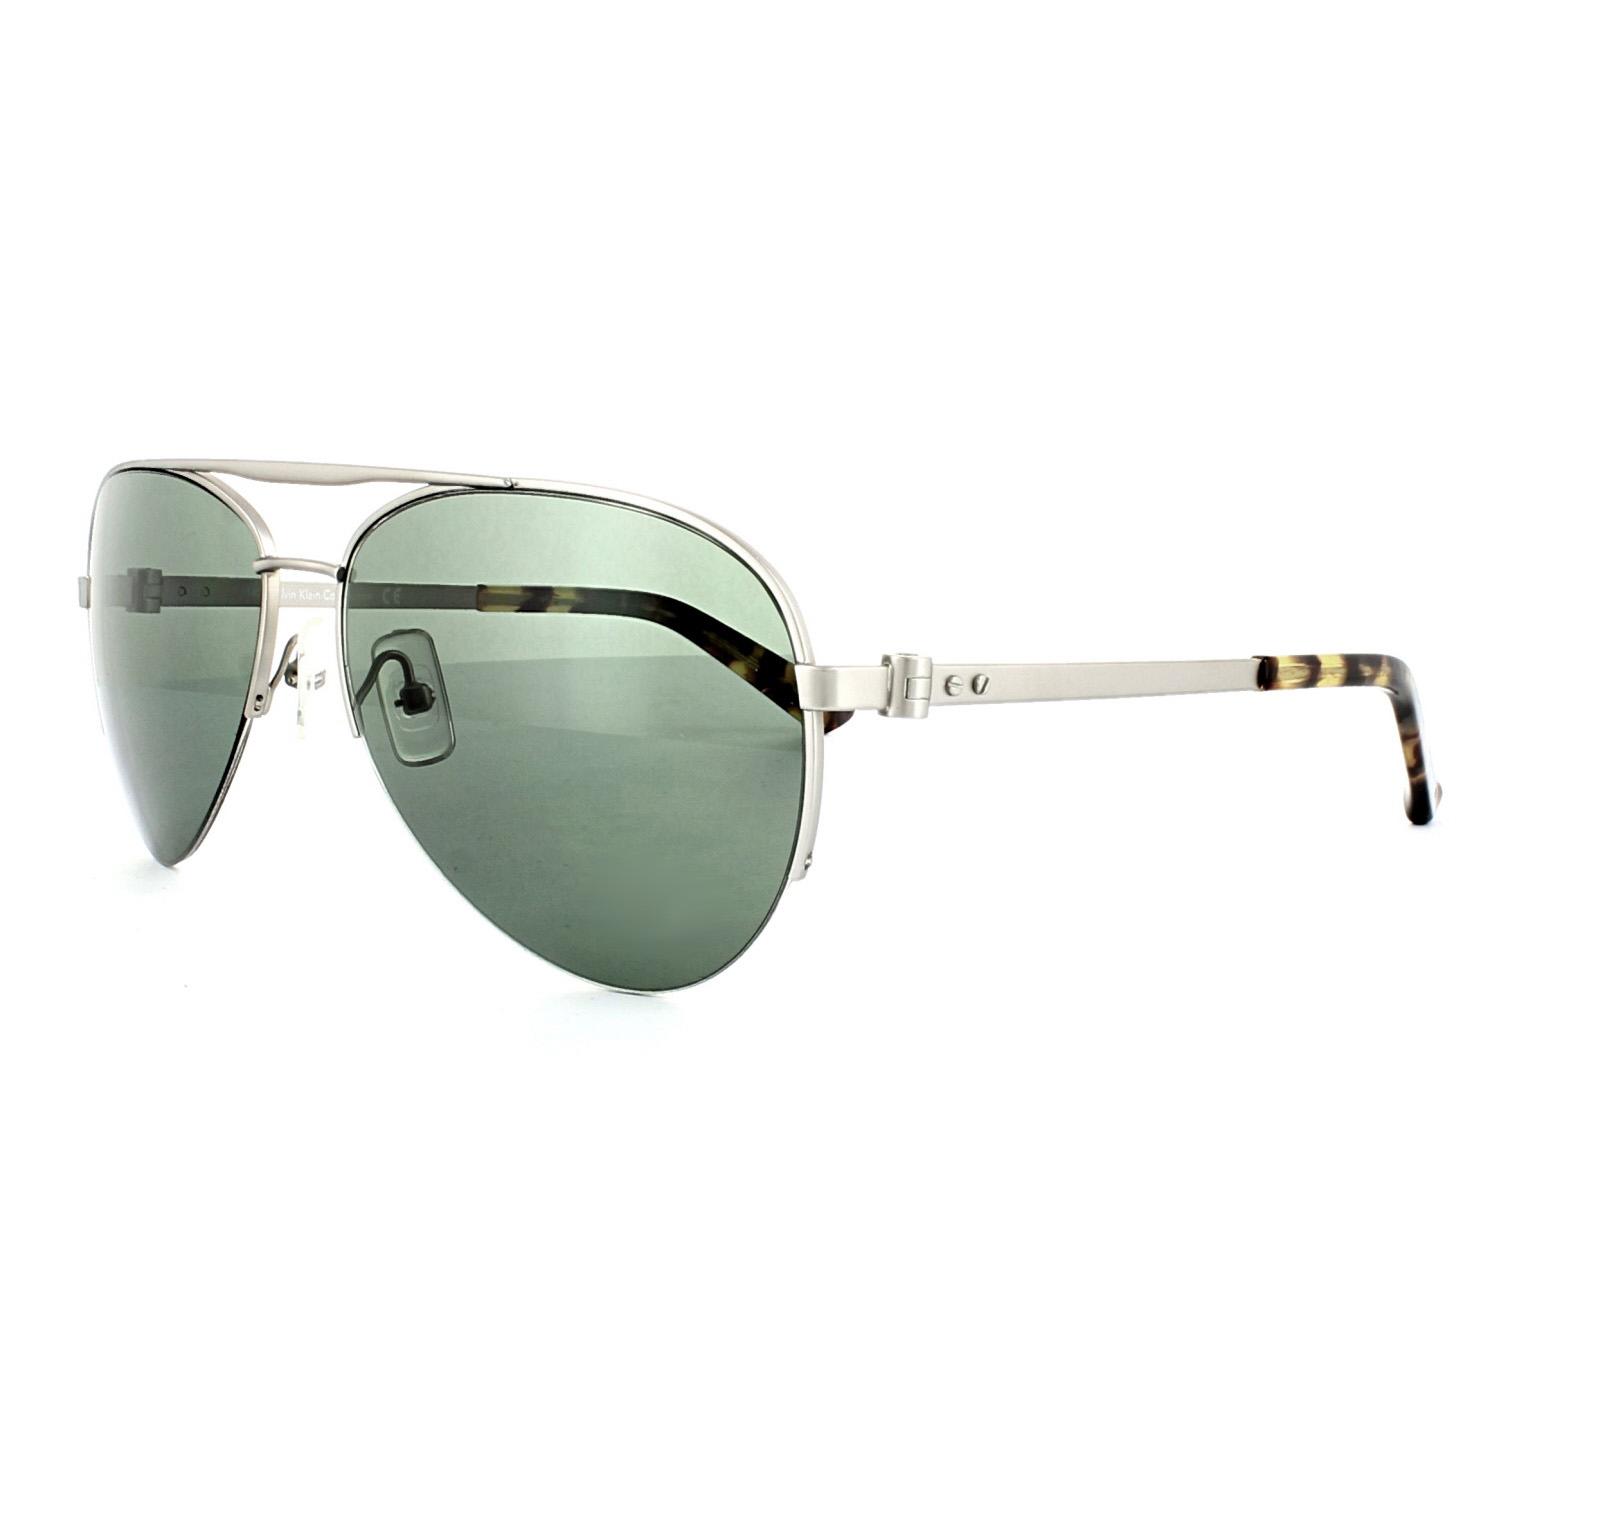 8602d825f5 Calvin Klein Sunglasses CK8000S 045 Silver Green 750779088111